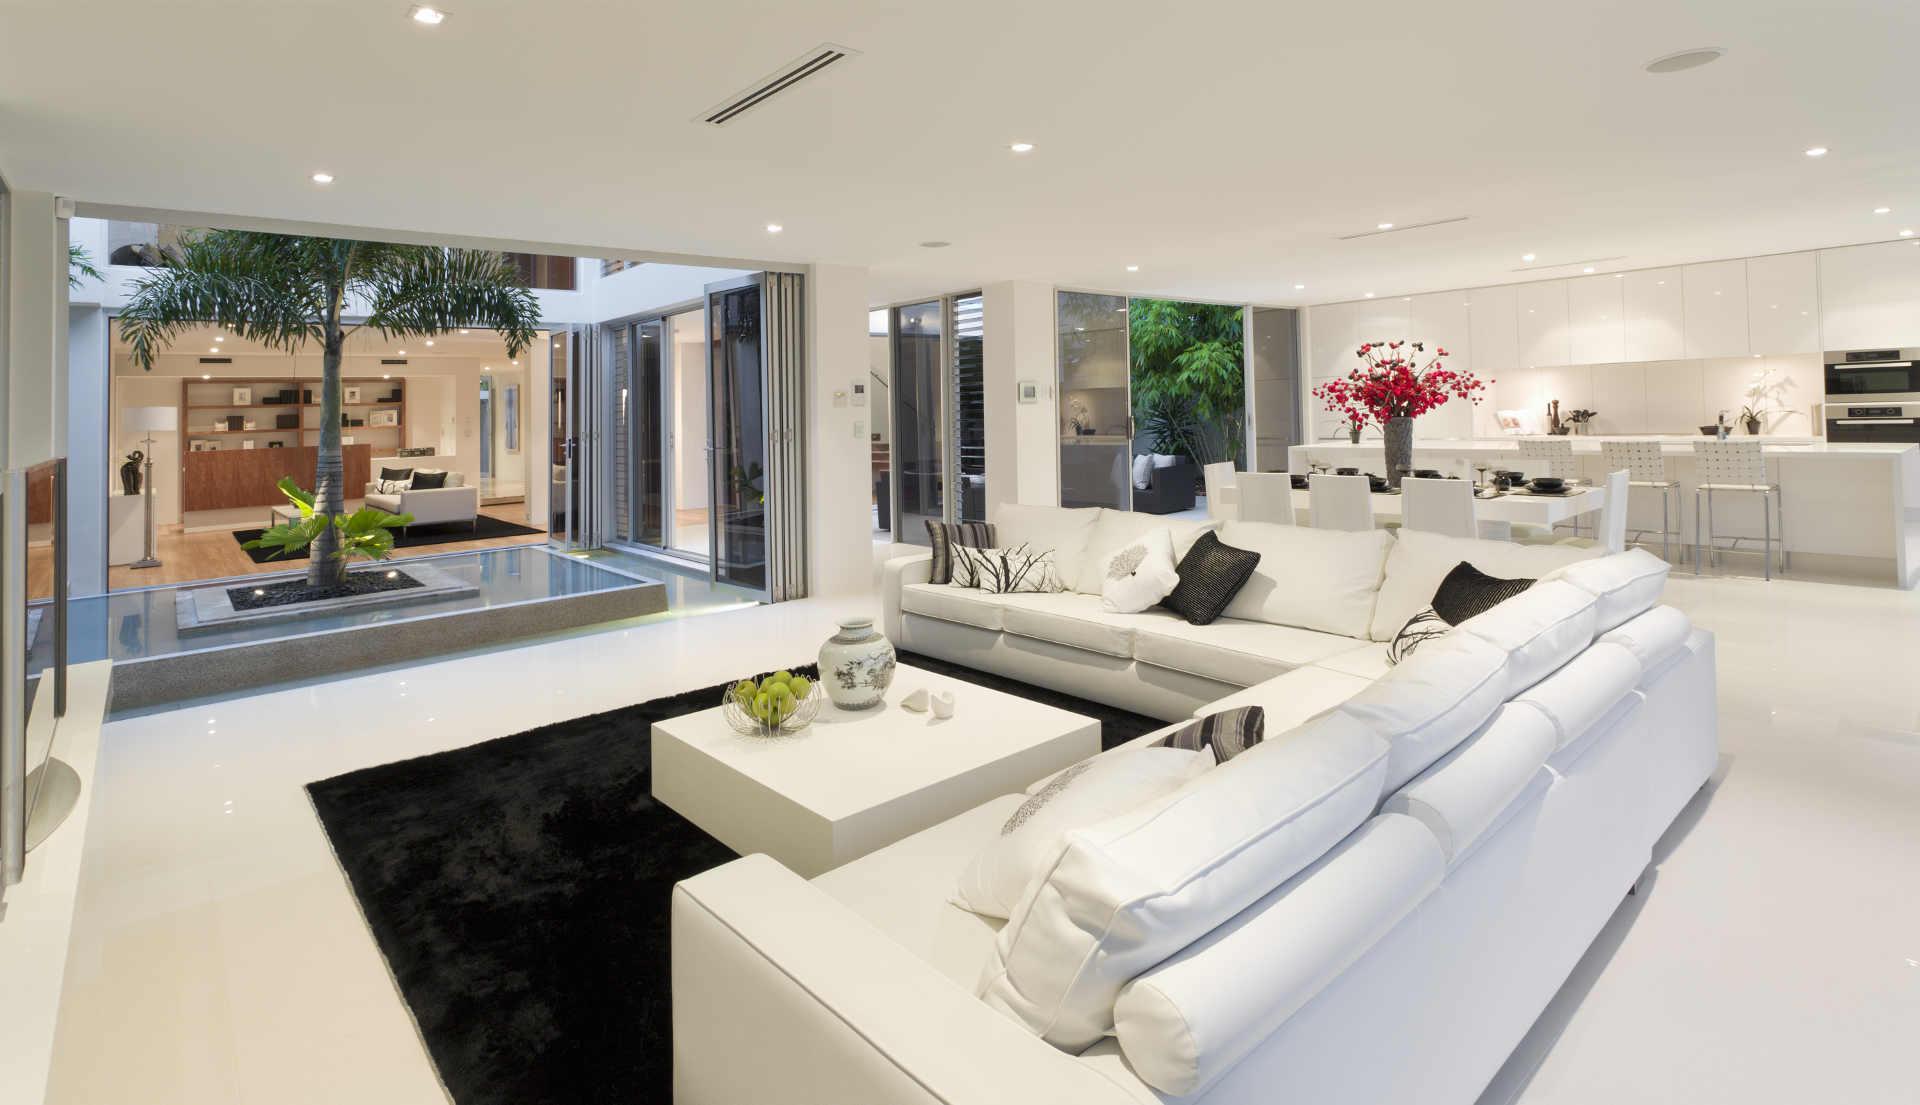 christian-fexer-immobilien-wuerzburg-wohnraum-weisses-interieur-verglasder-innenhof